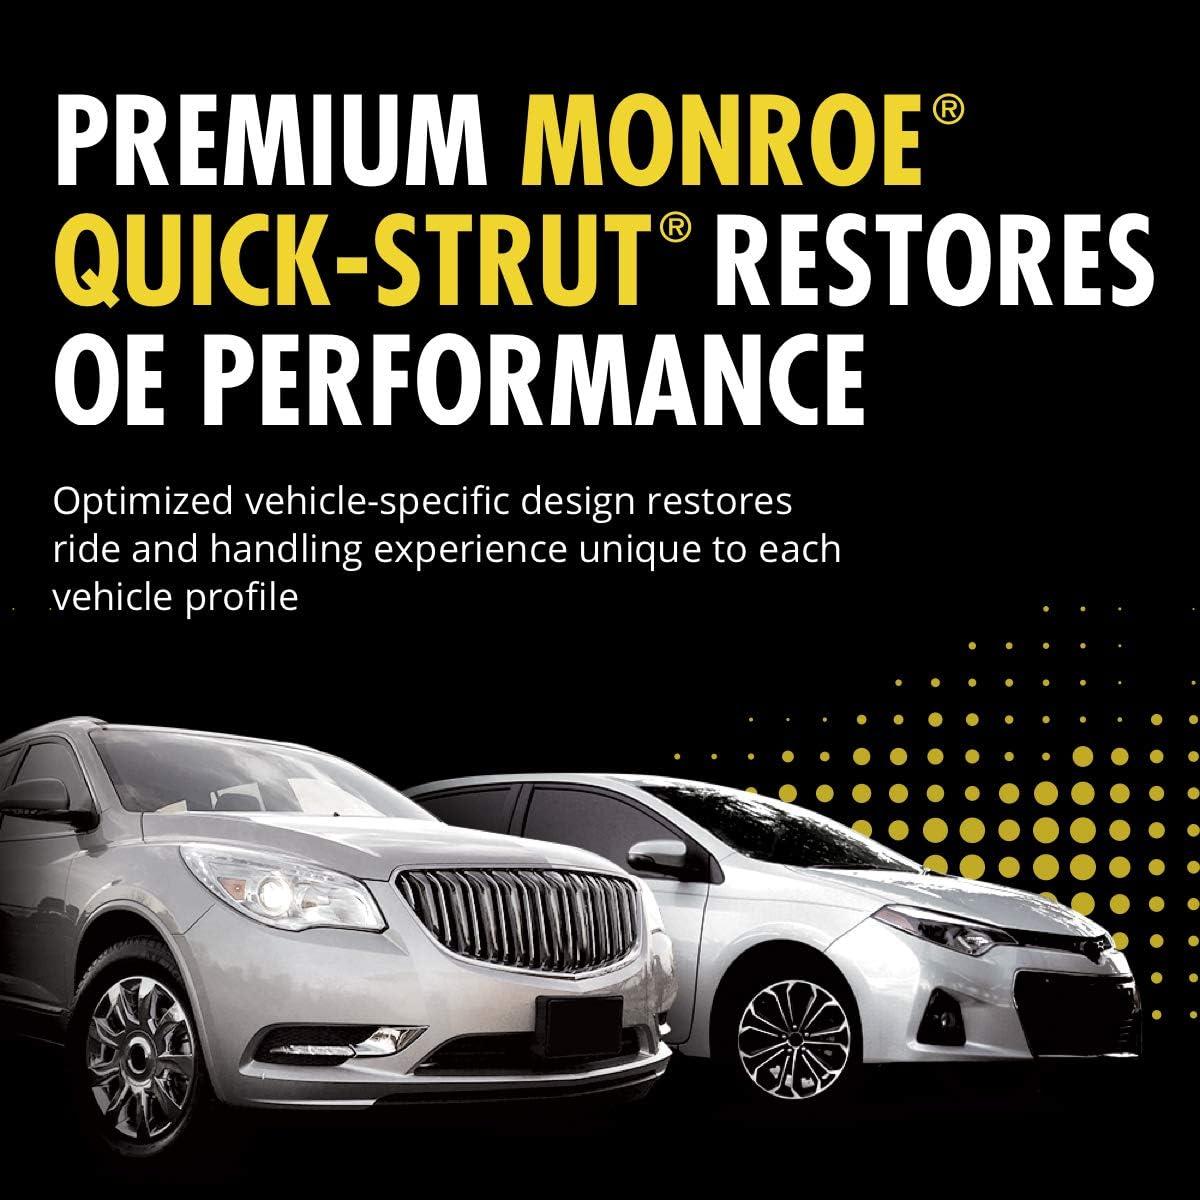 Monroe Shocks /& Struts 172728 Monroe Quick-Strut Complete Strut Assembly Suspension Strut and Coil Spring Assembly